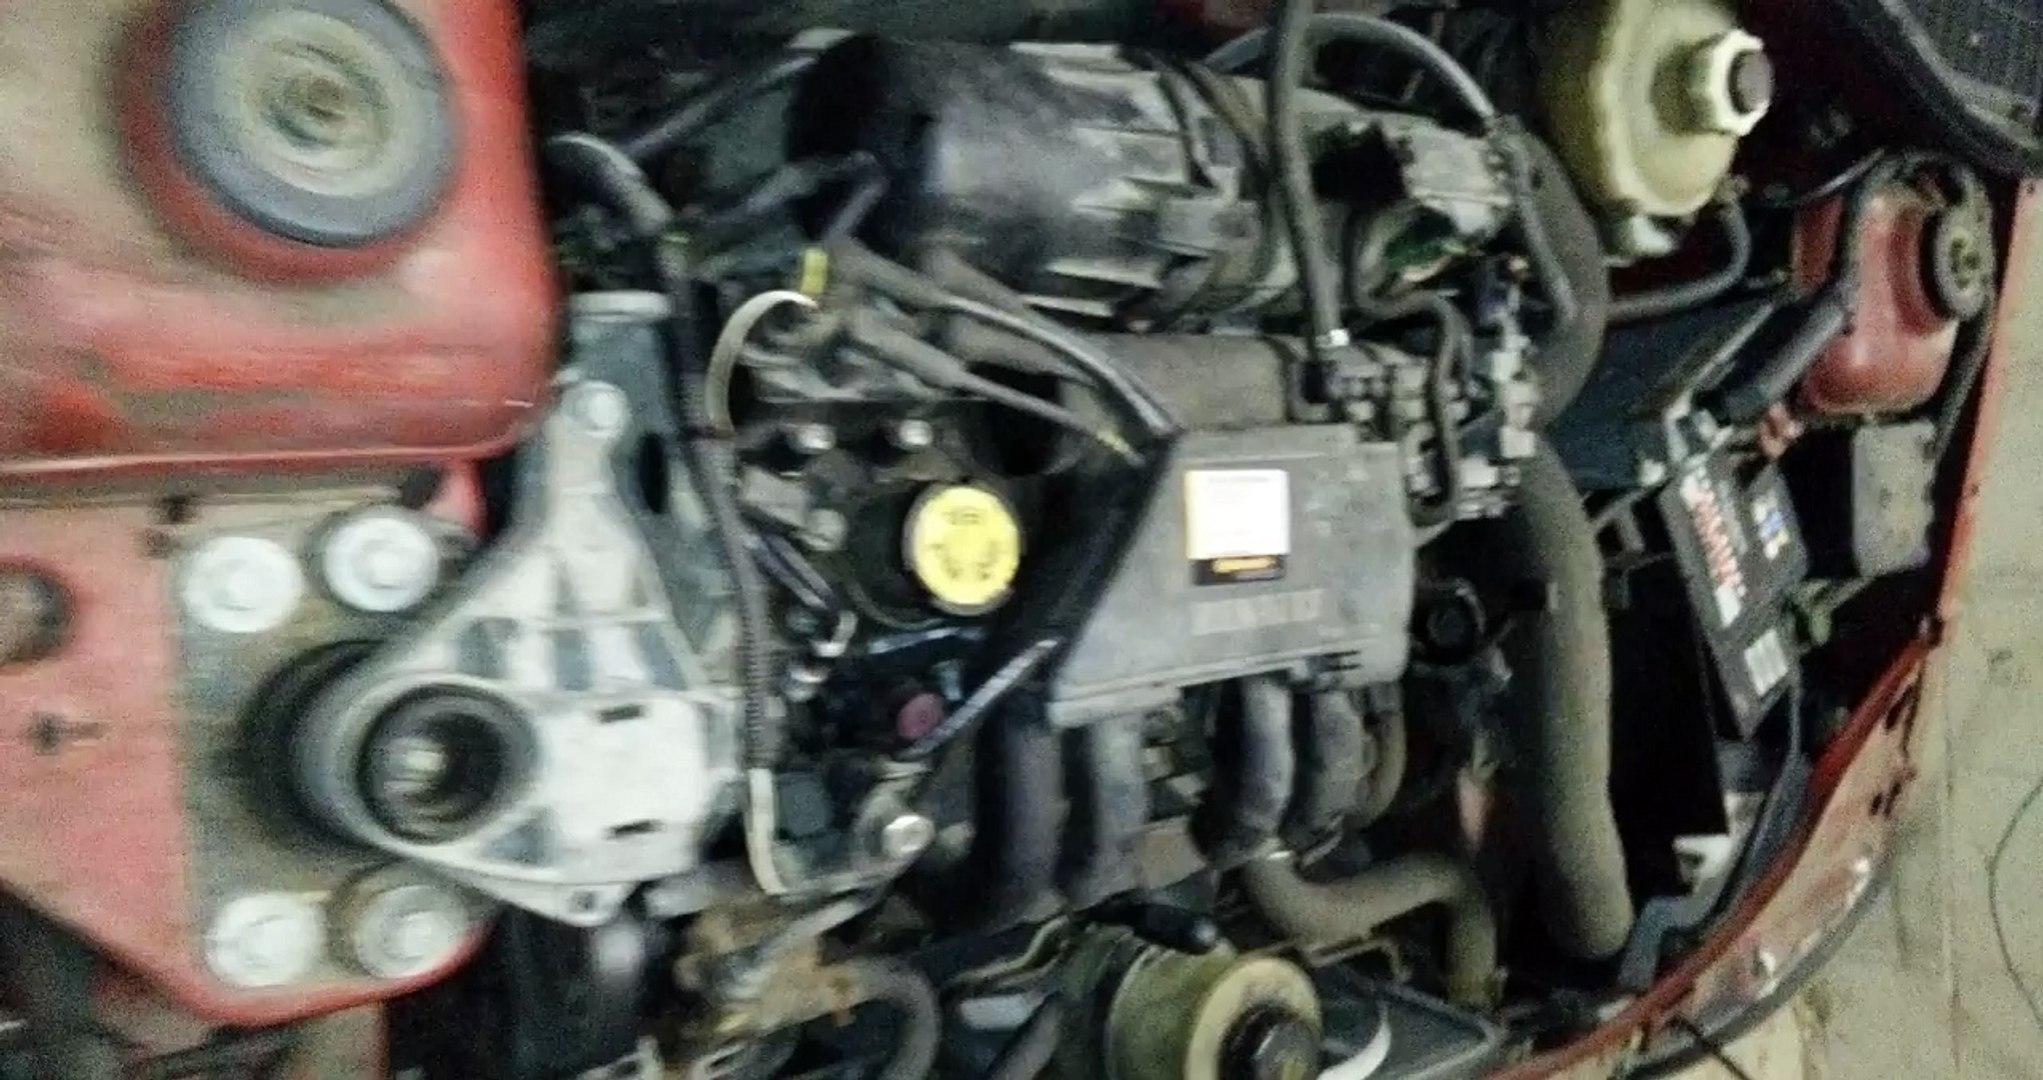 Renault Clio I Phase 3 1997 1.2i (58bhp, D7F 8v) Engine trouble